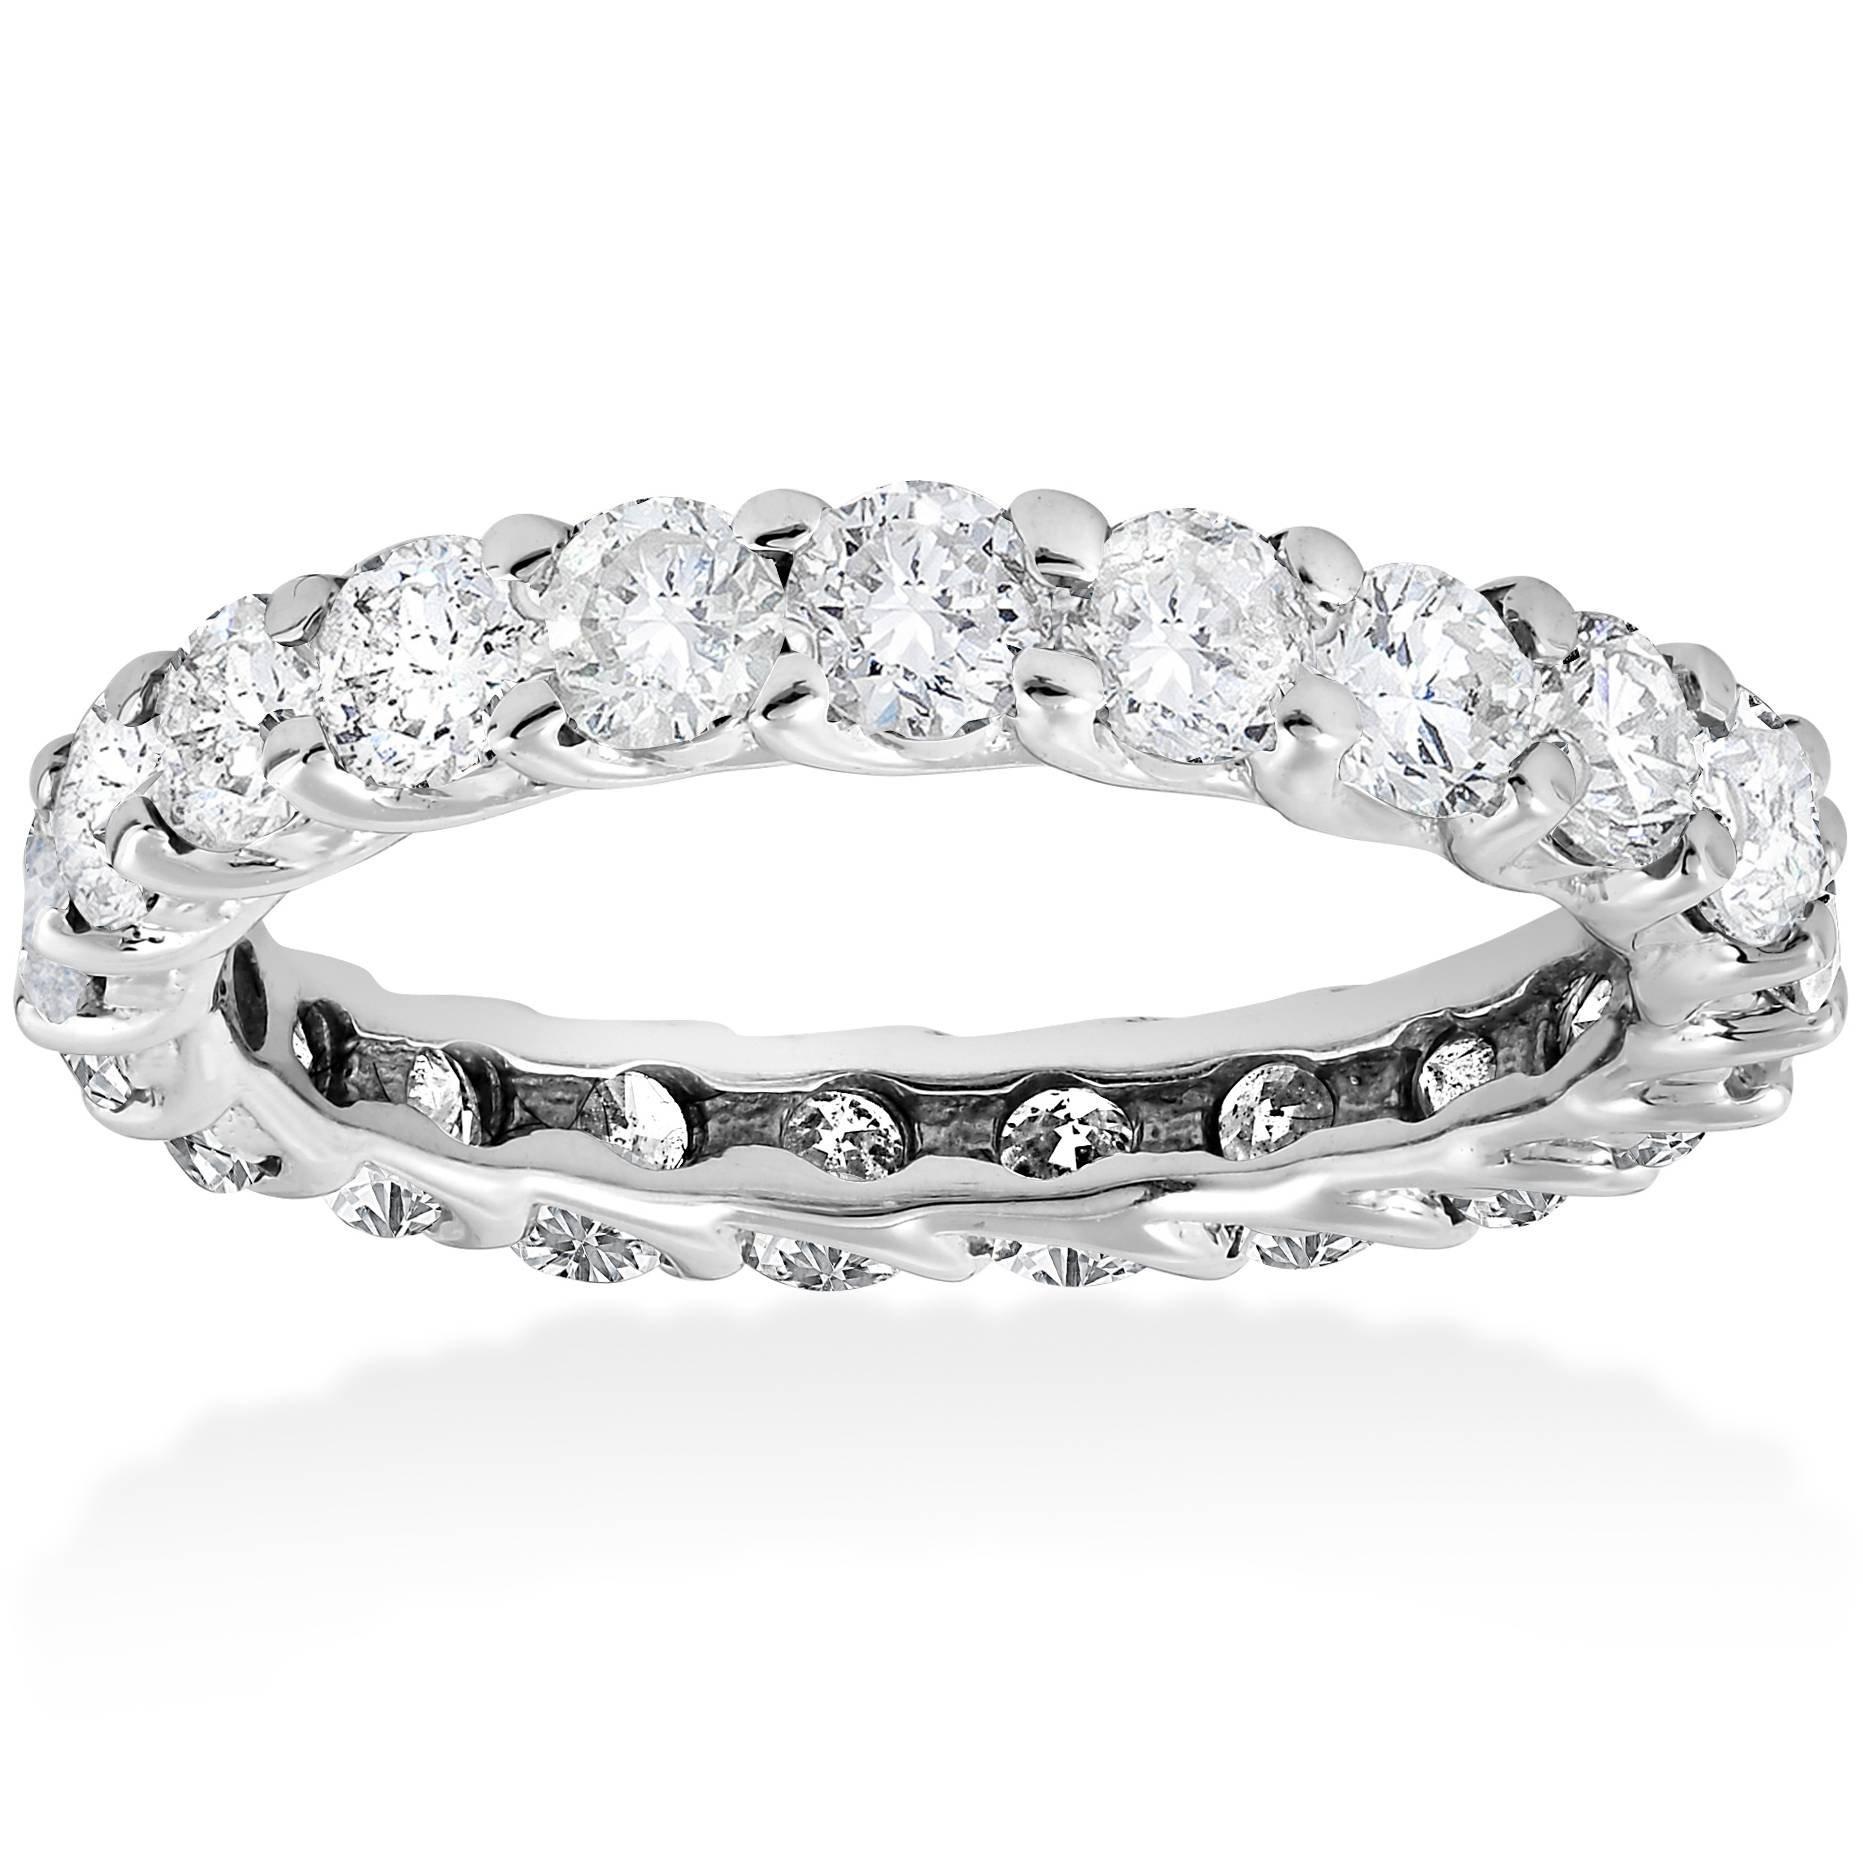 3ct Trellis Diamond Eternity Ring 14K White Gold